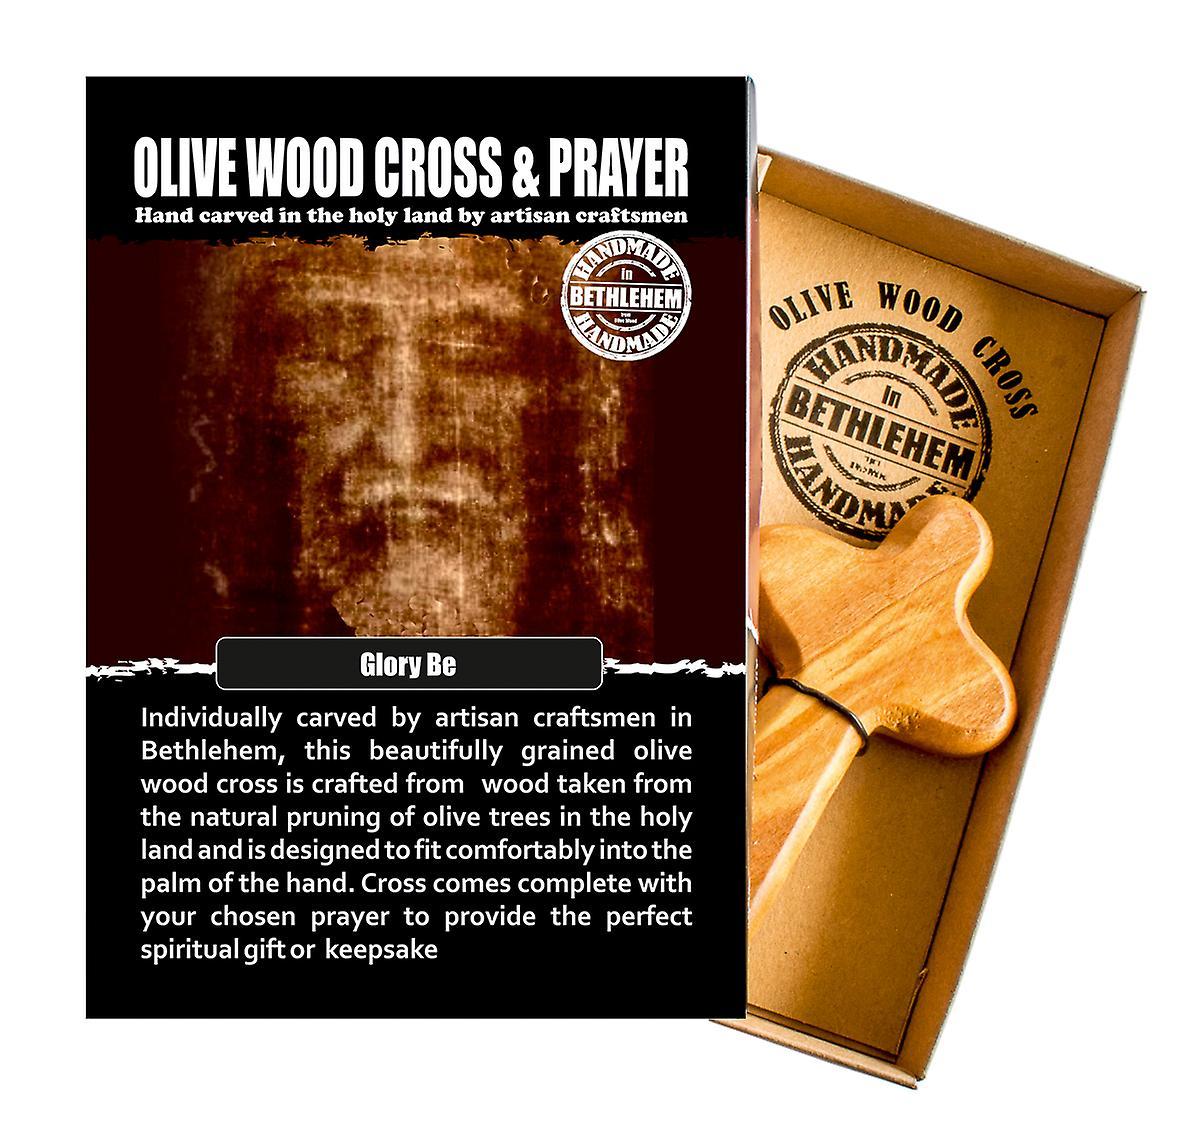 Glory Be Carved Olive Wood Comfort Cross Religious Keepsake Hand Made In Bethlehem